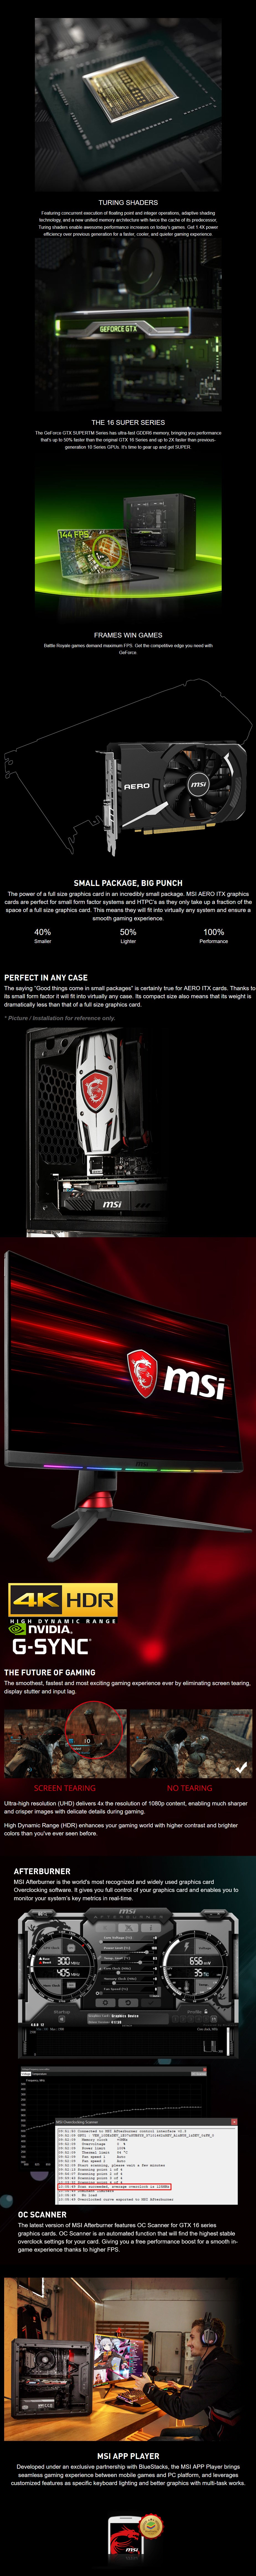 MSI GeForce GTX 1650 SUPER AERO ITX OC 4GB Video Card - Overview 1